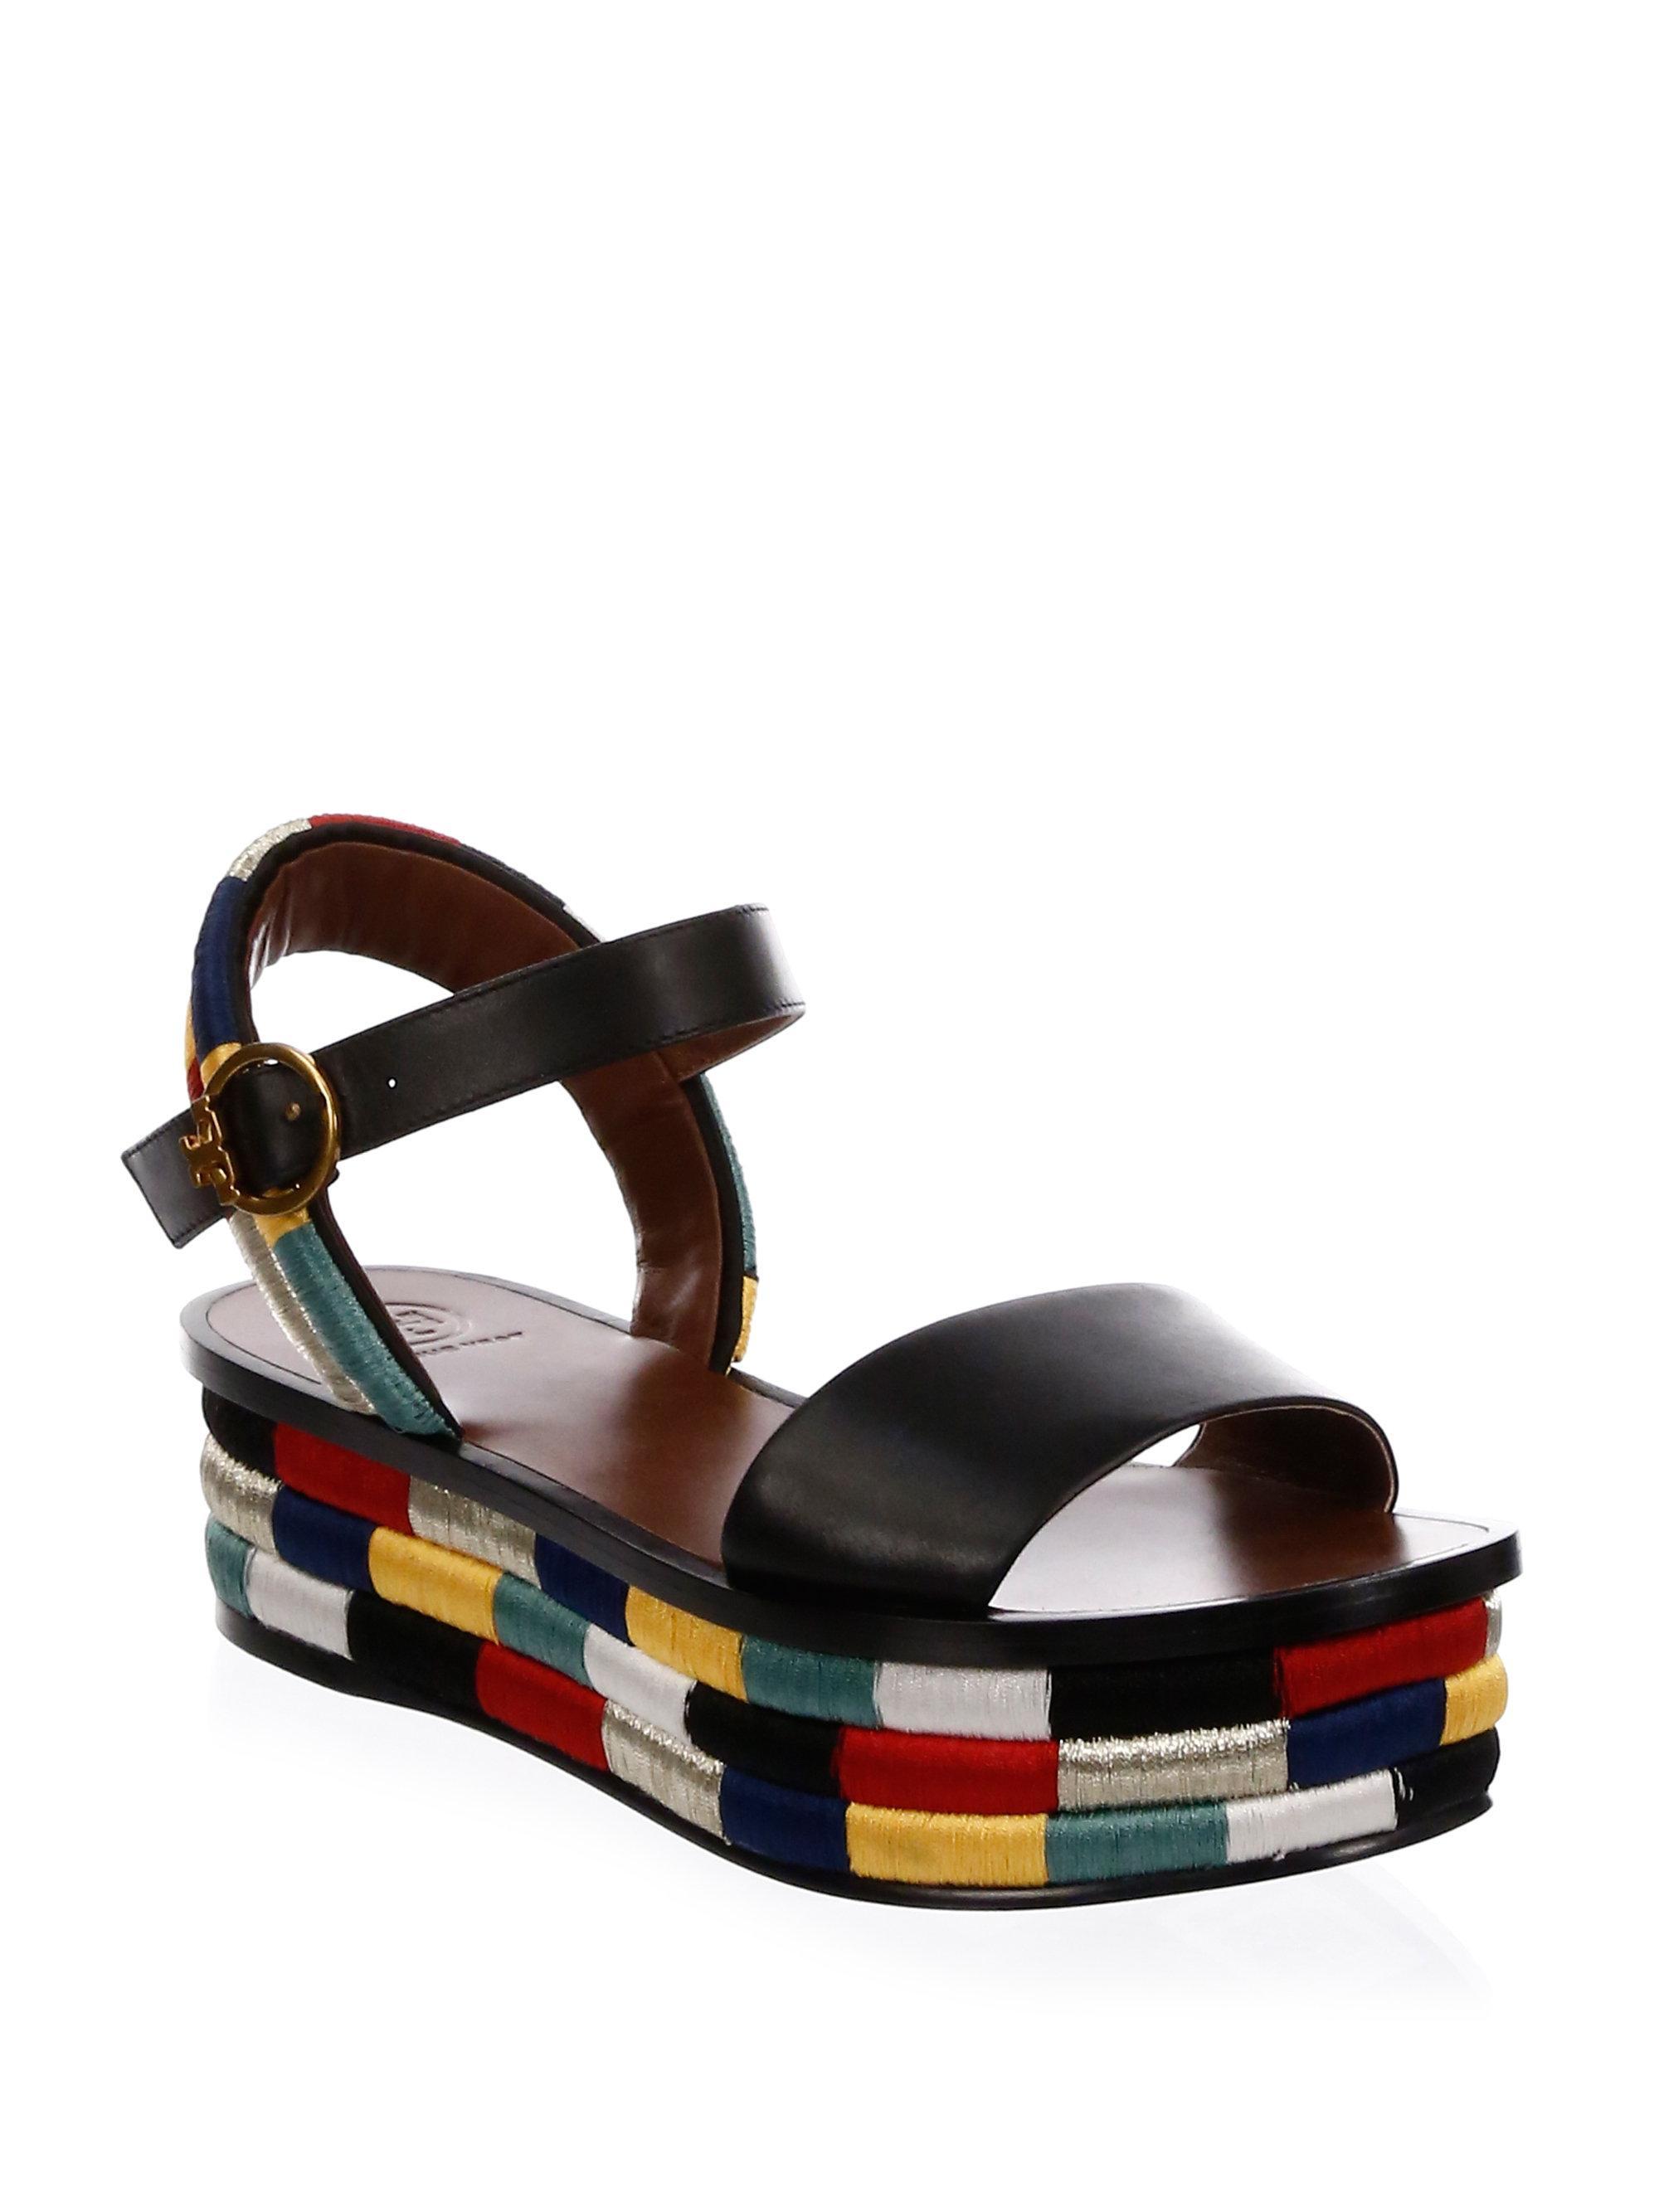 f2fadcea4d7b Lyst - Tory Burch Camilla Flatform Sandals in Black